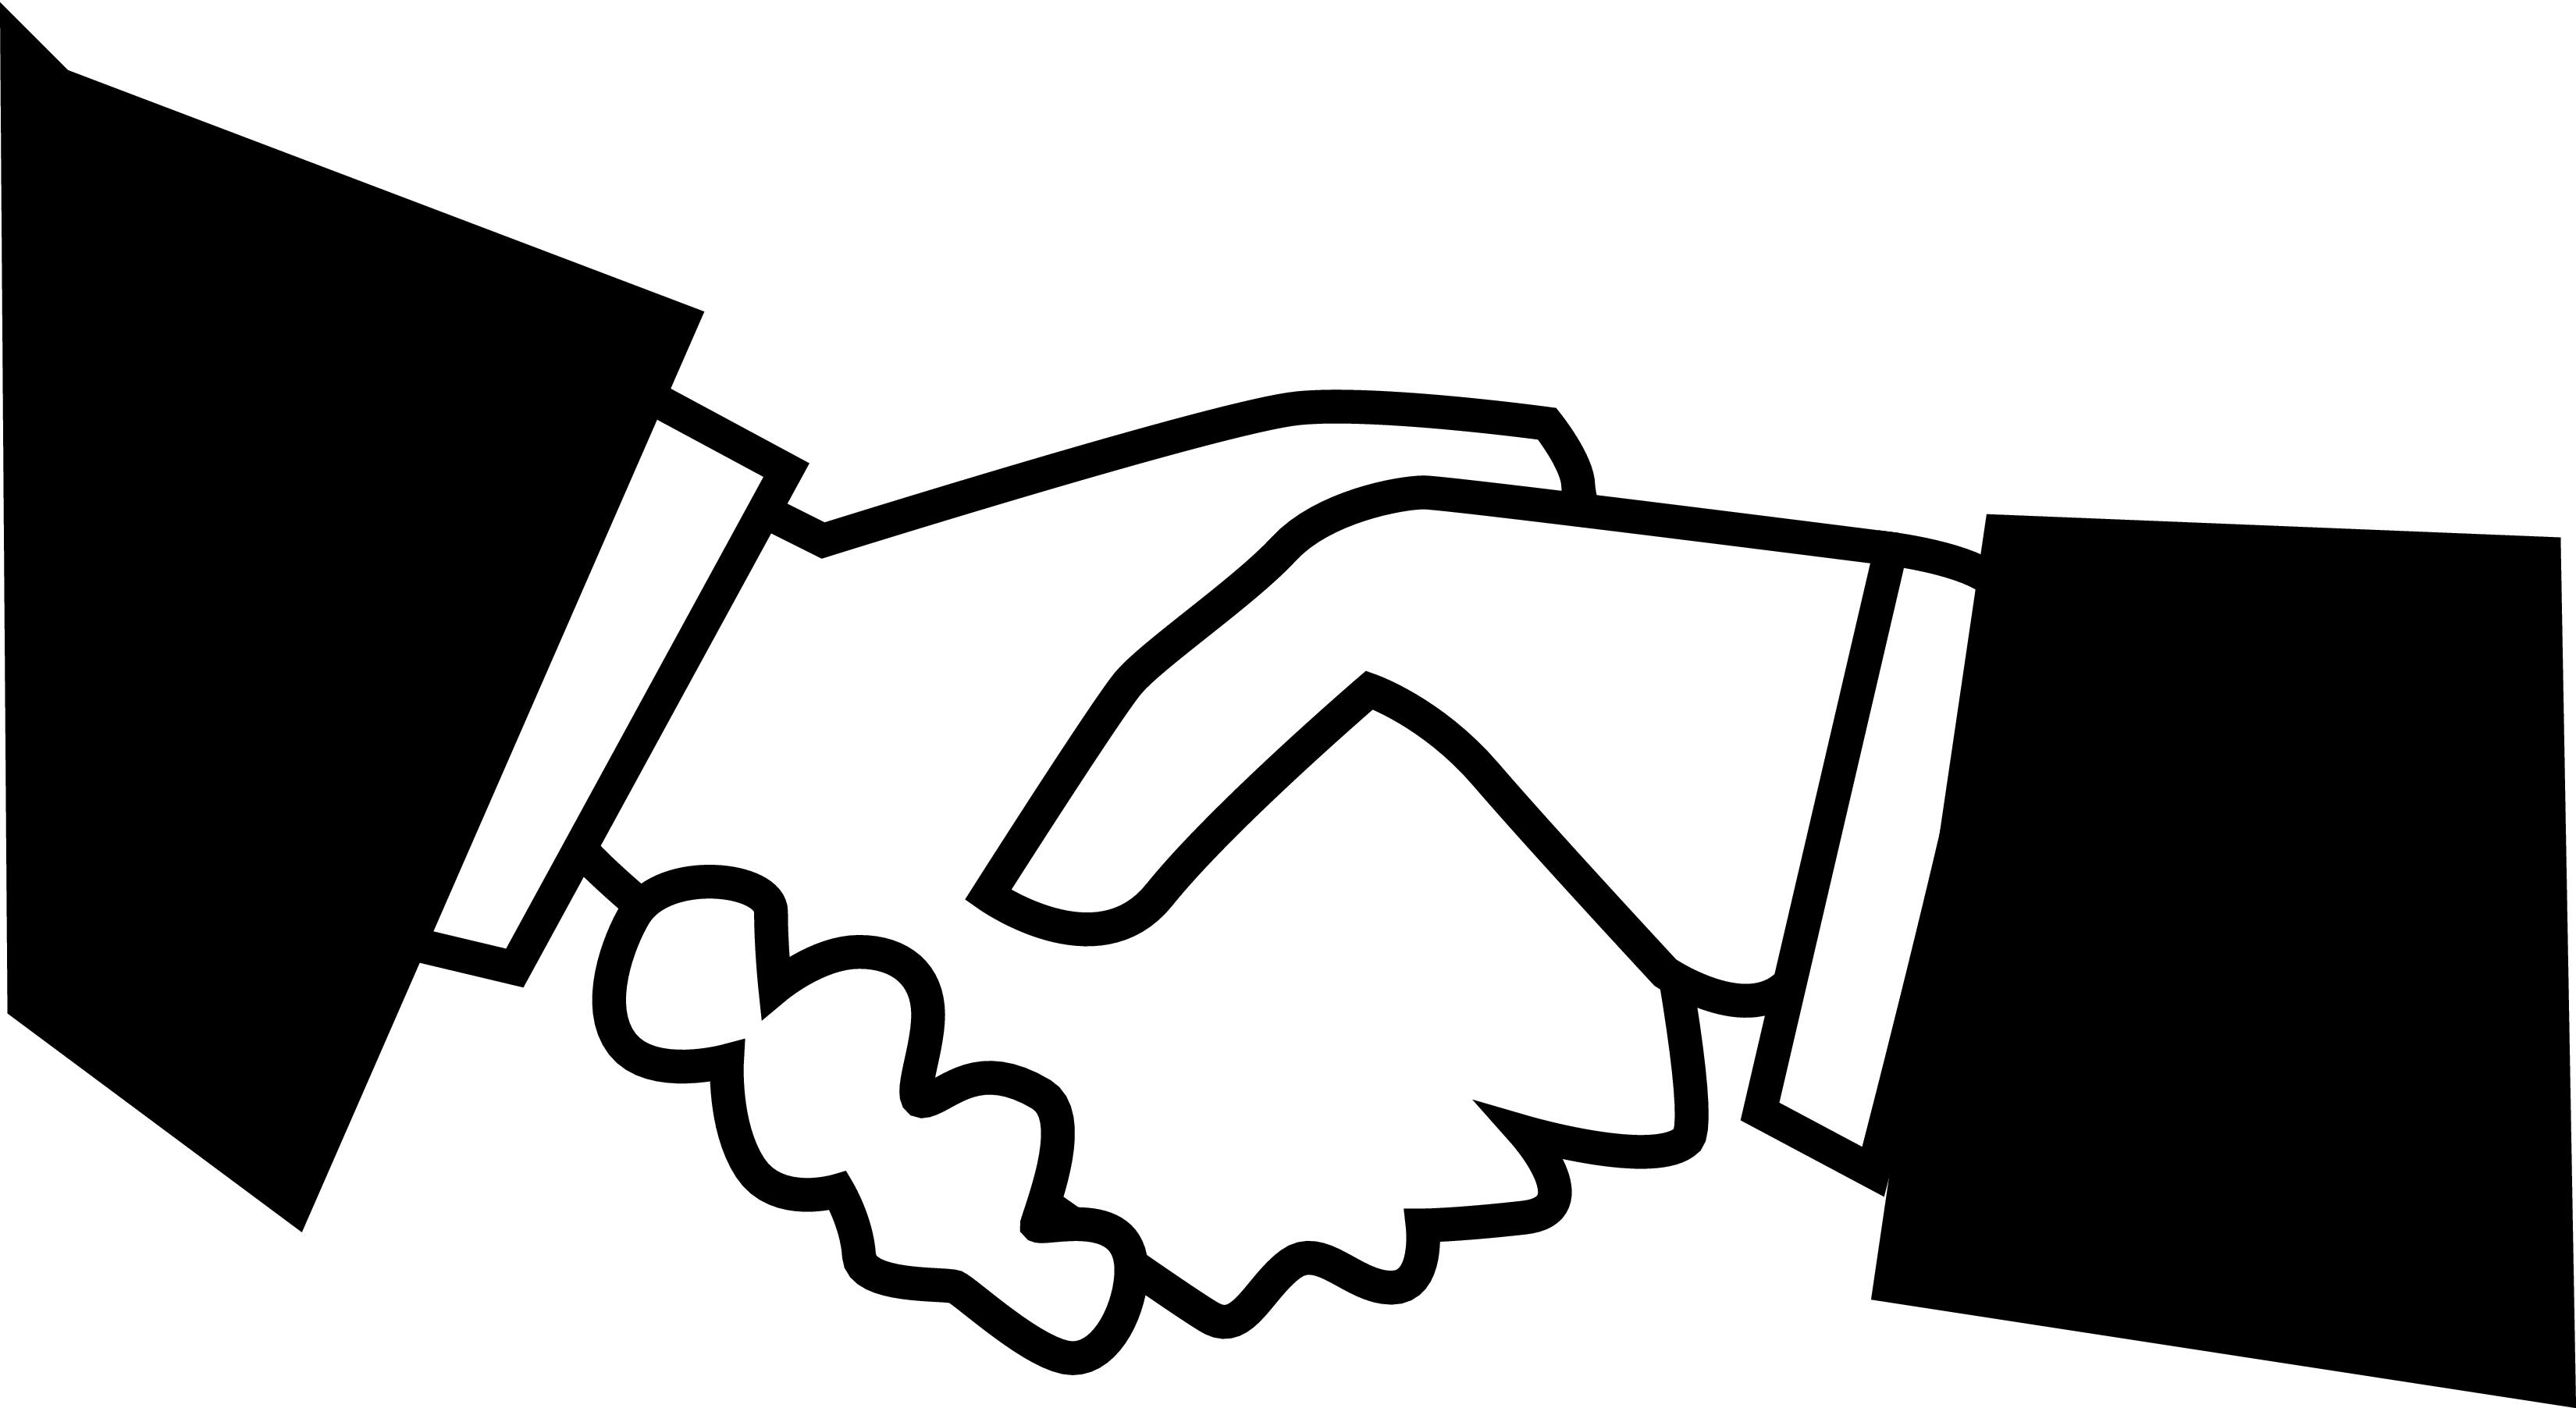 Logo clipart shake hand Black hand clipart Shaking hands